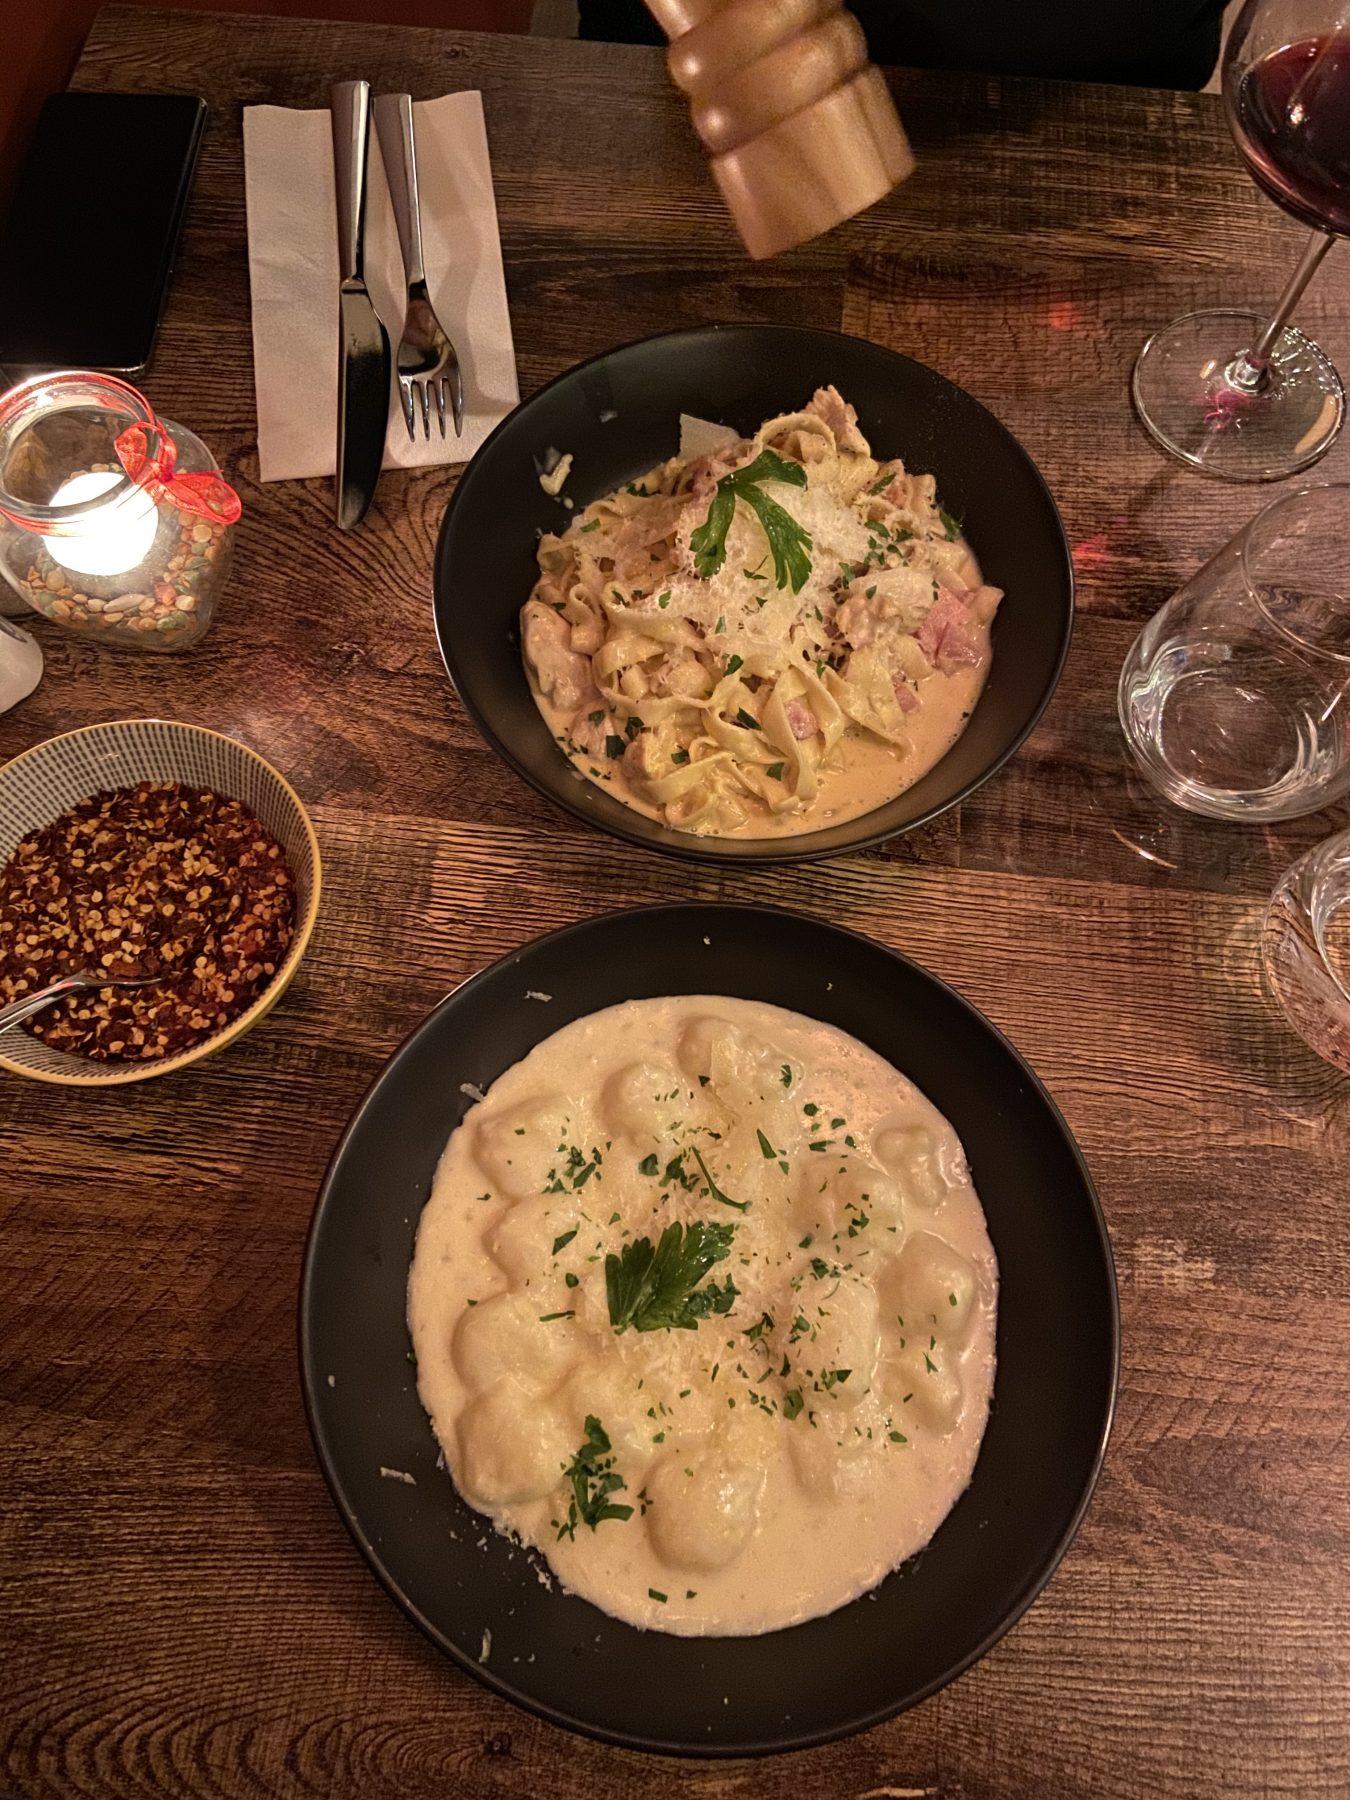 Puglia Restaurant Kingsland Italian Food Pasta Gnocci Main Menu